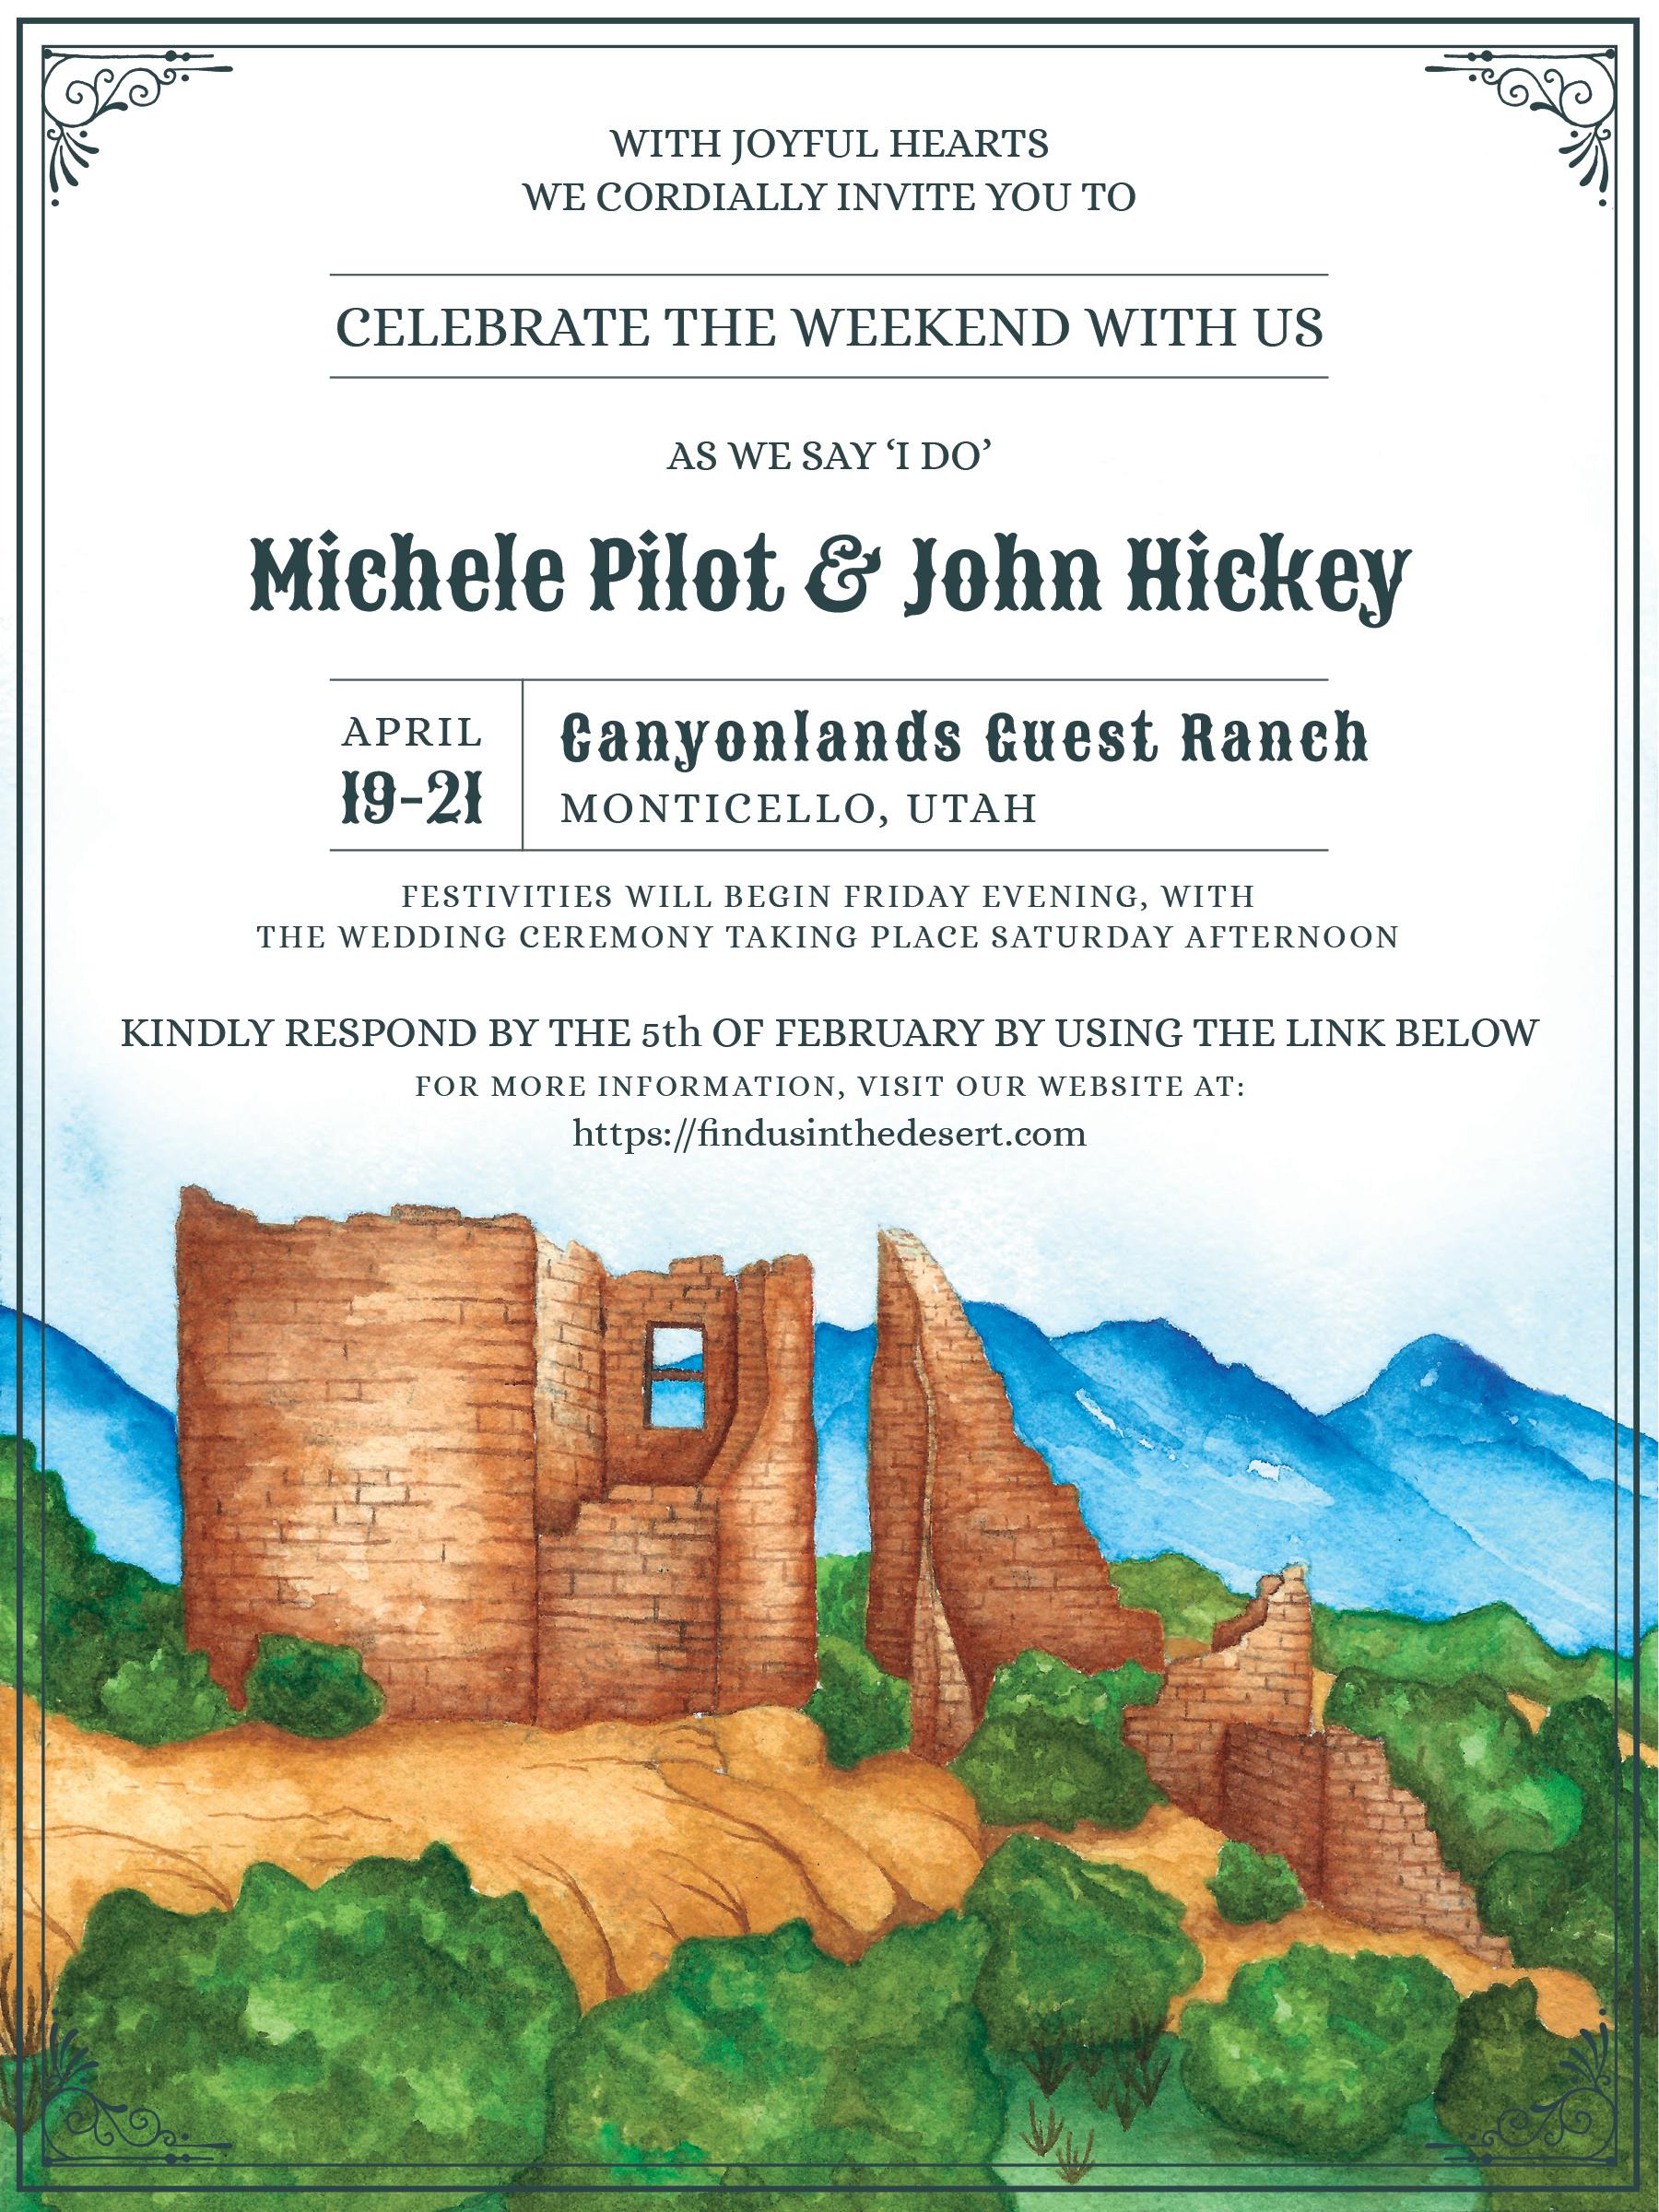 Michele and John